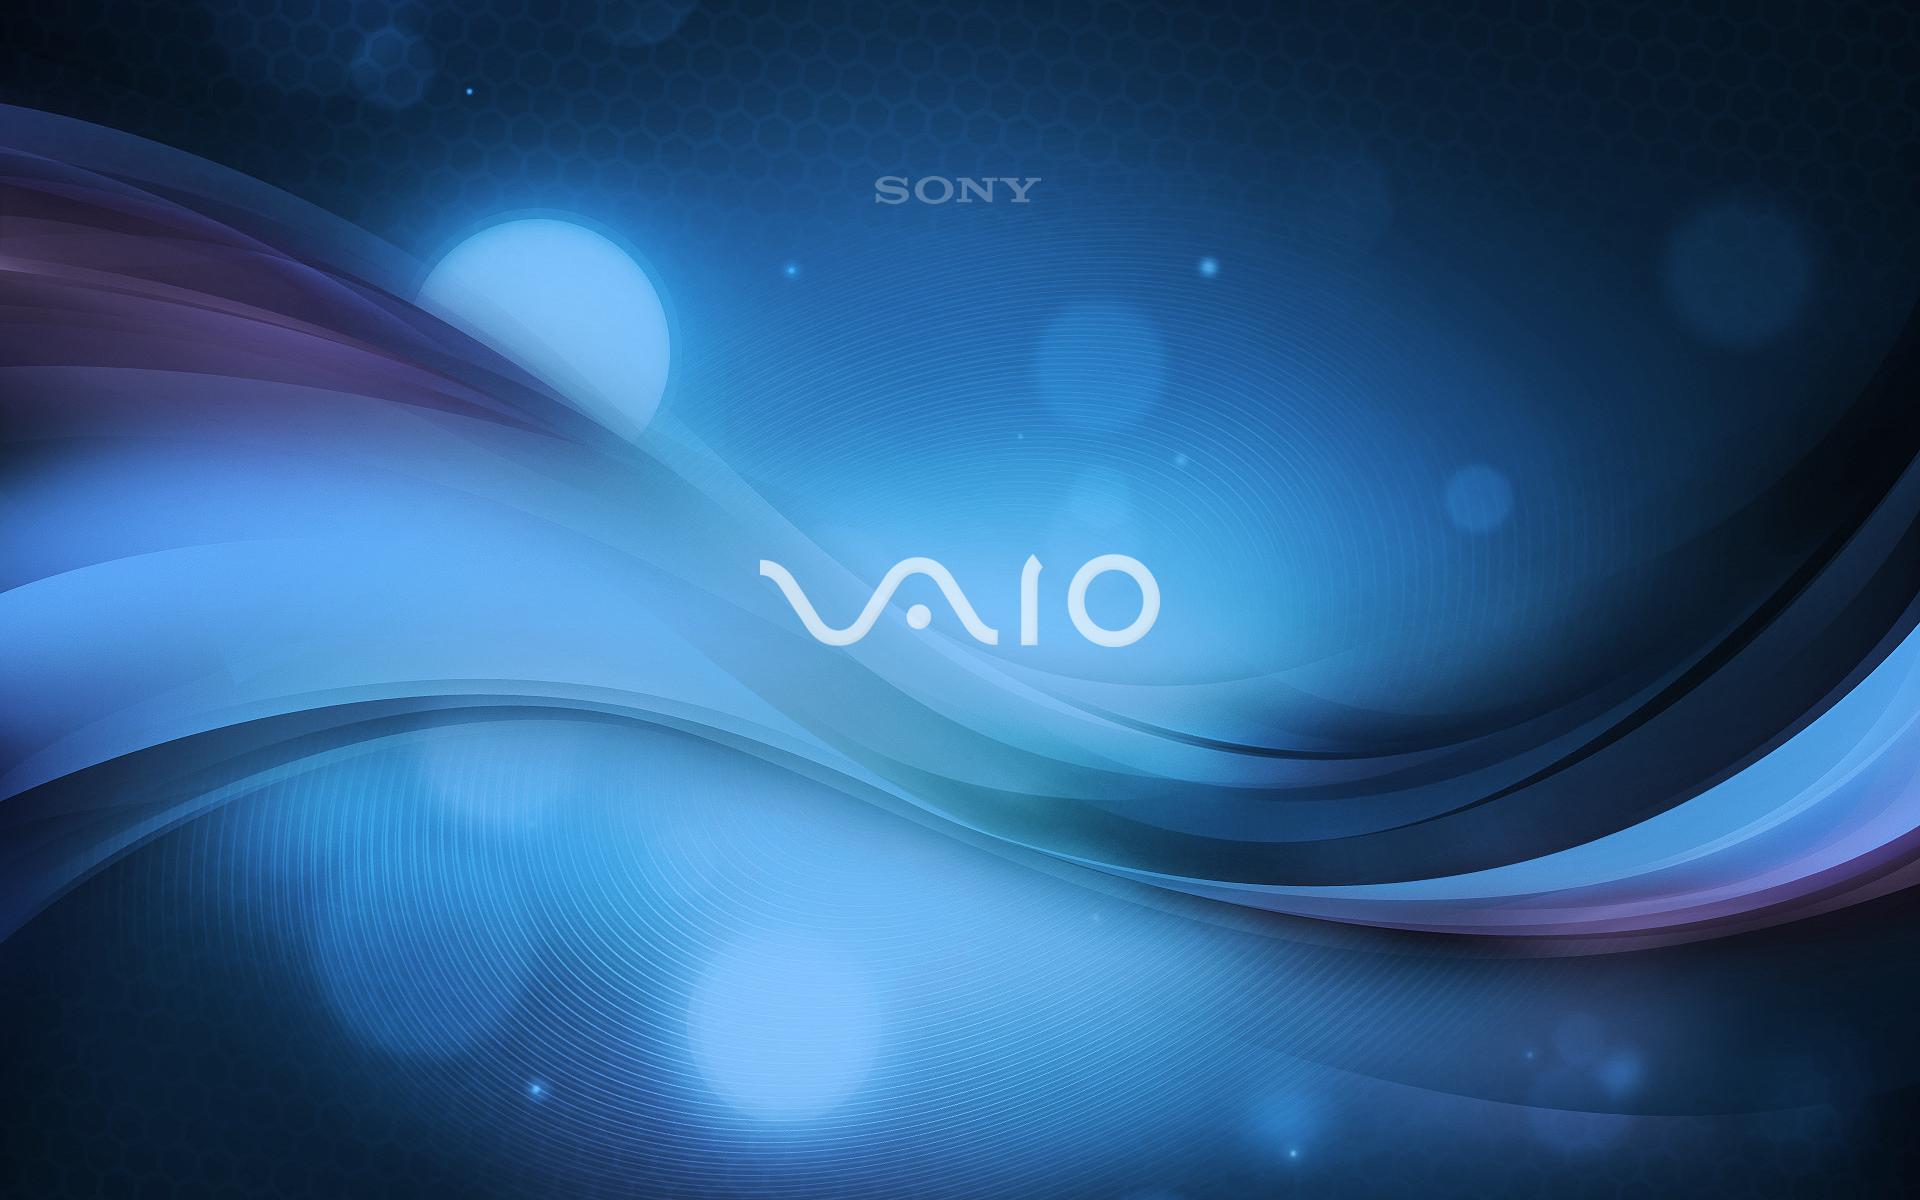 Vaio white by ksbansal